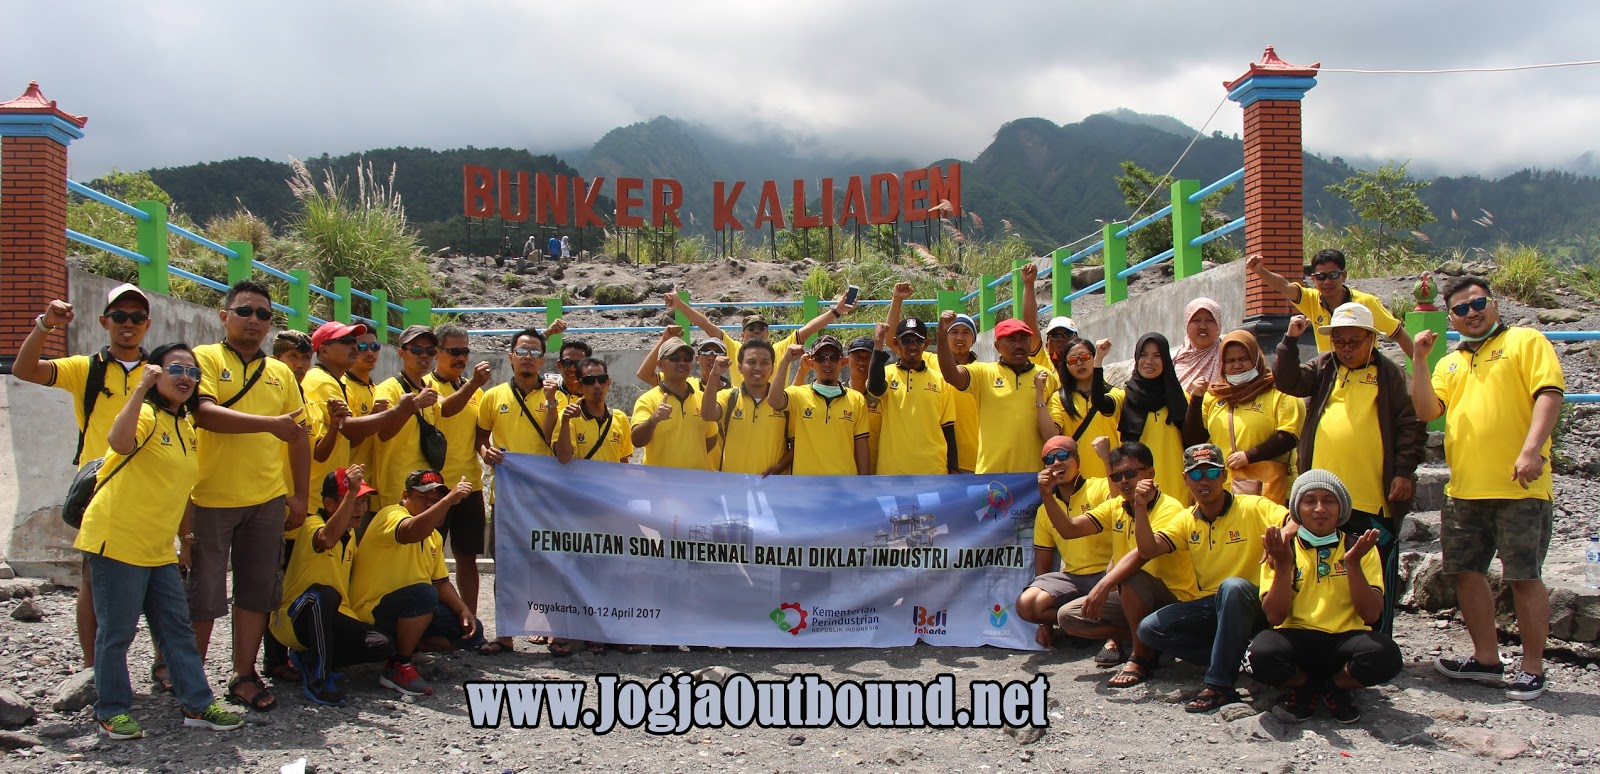 Lokasi Bunker Merapi Kaliadem Lava Tour Salah Spot Wisata Unggulan